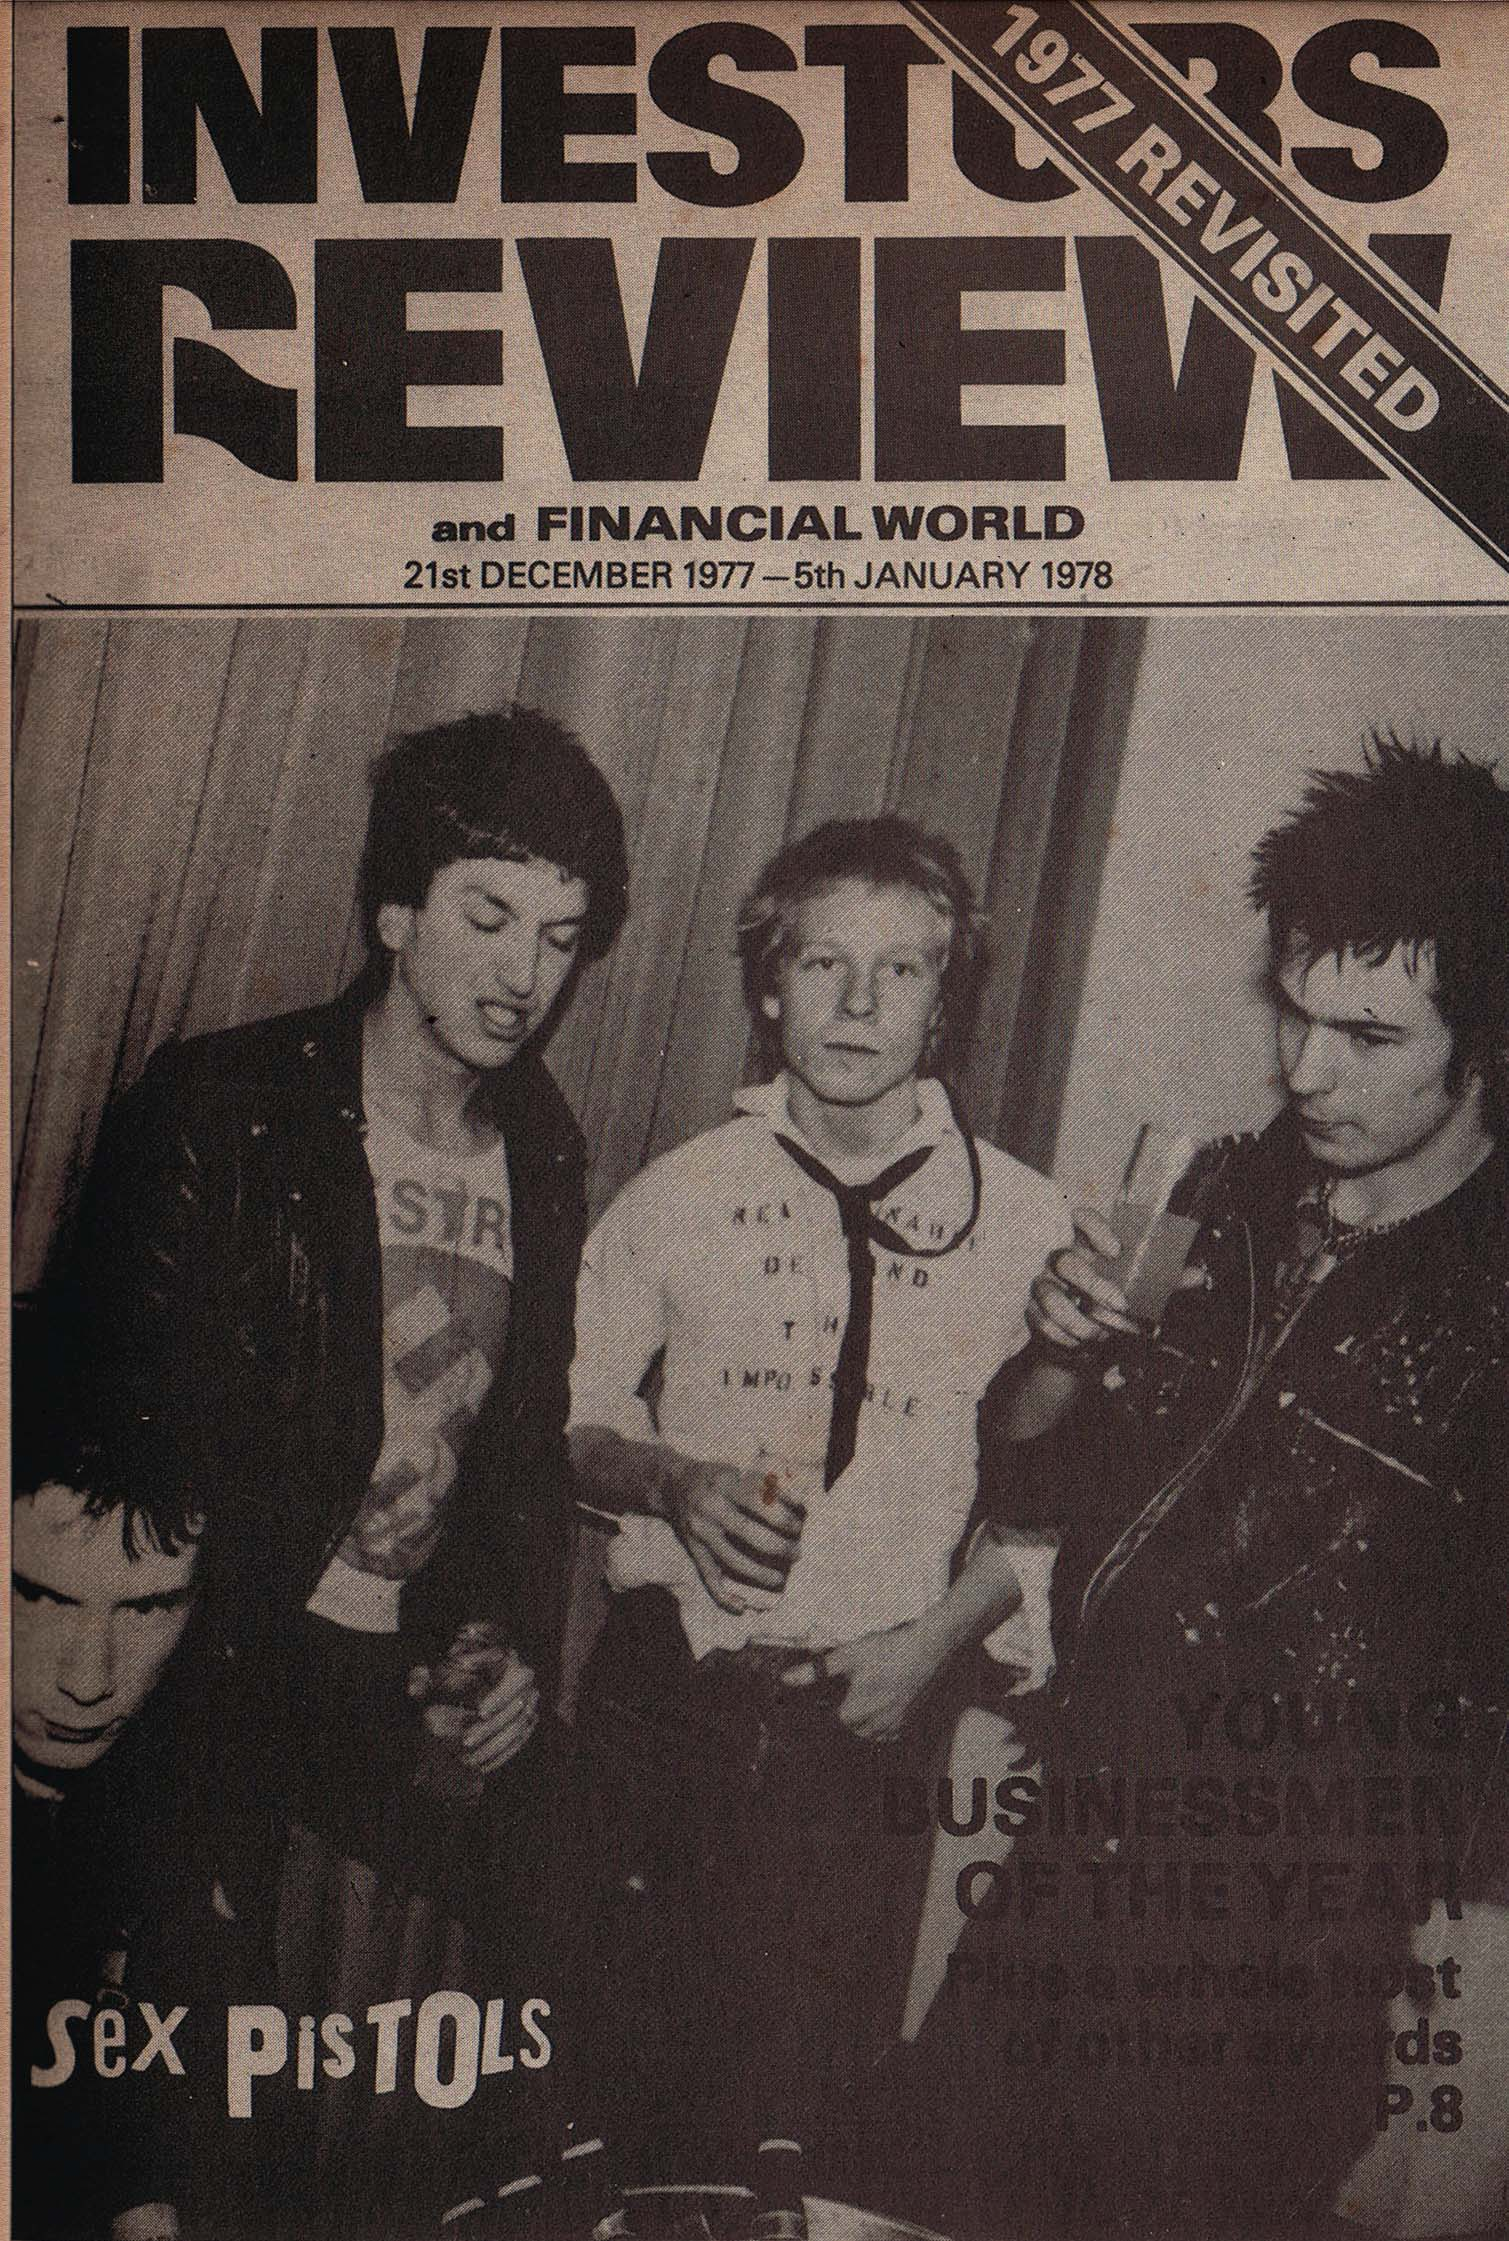 Investors review, december 1977